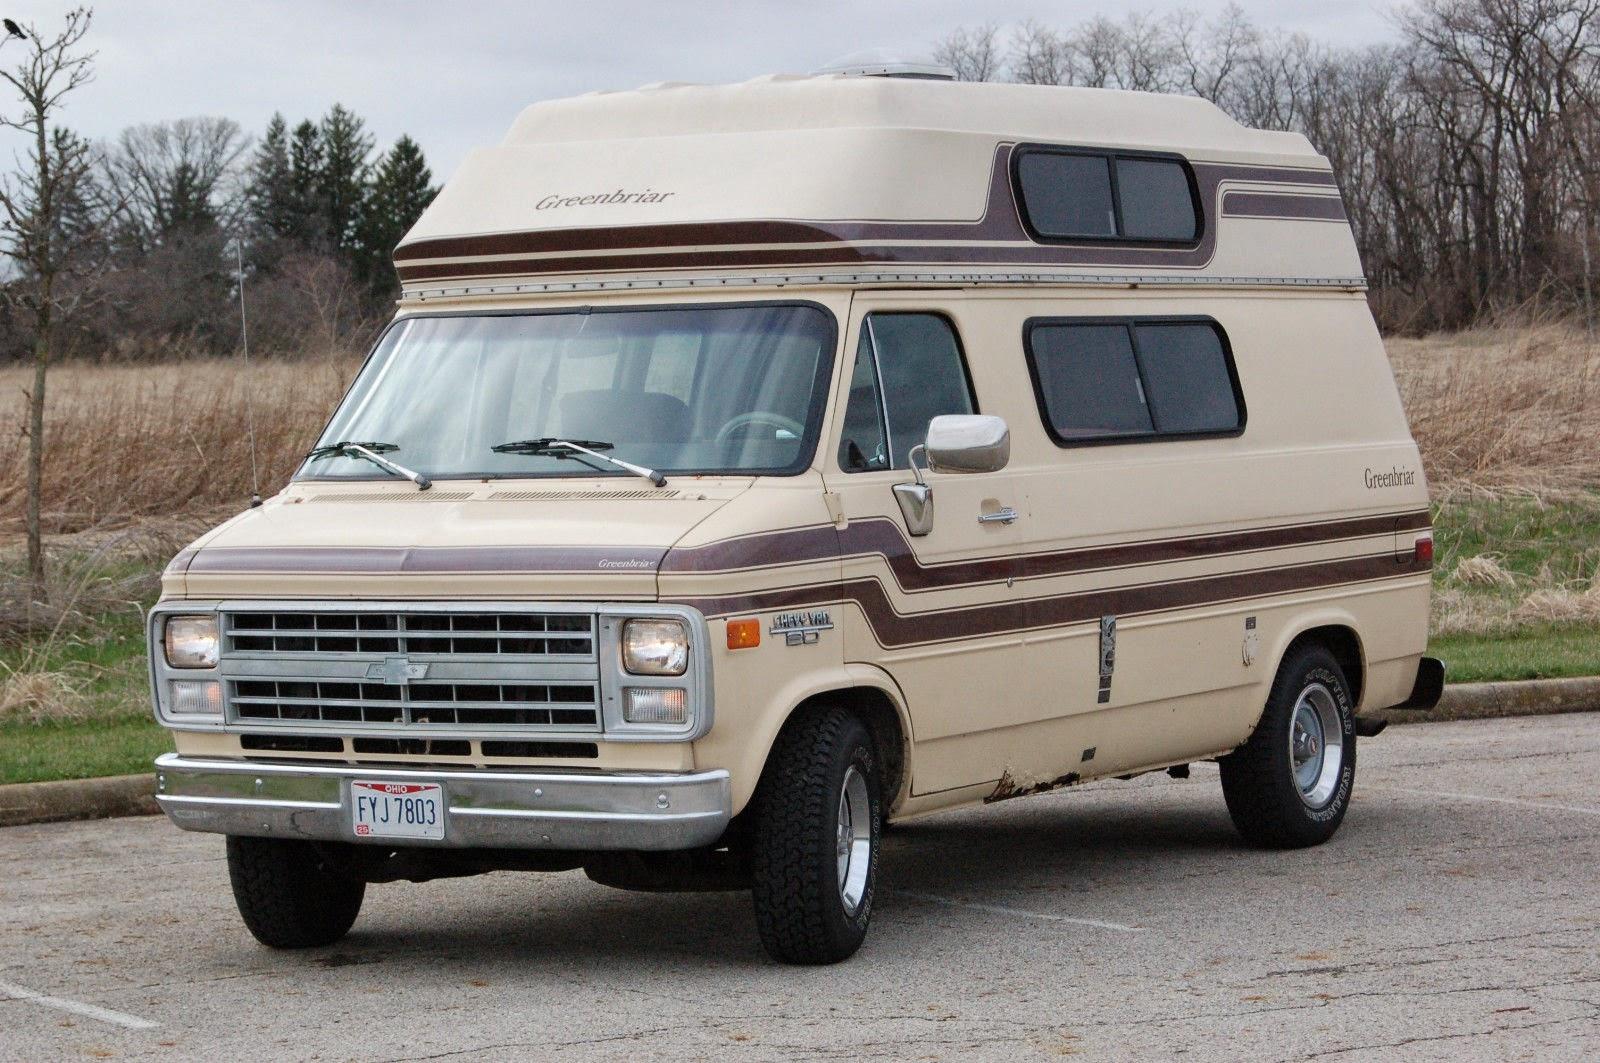 all american classic cars 1985 chevrolet g20 chevy van conversion van. Black Bedroom Furniture Sets. Home Design Ideas